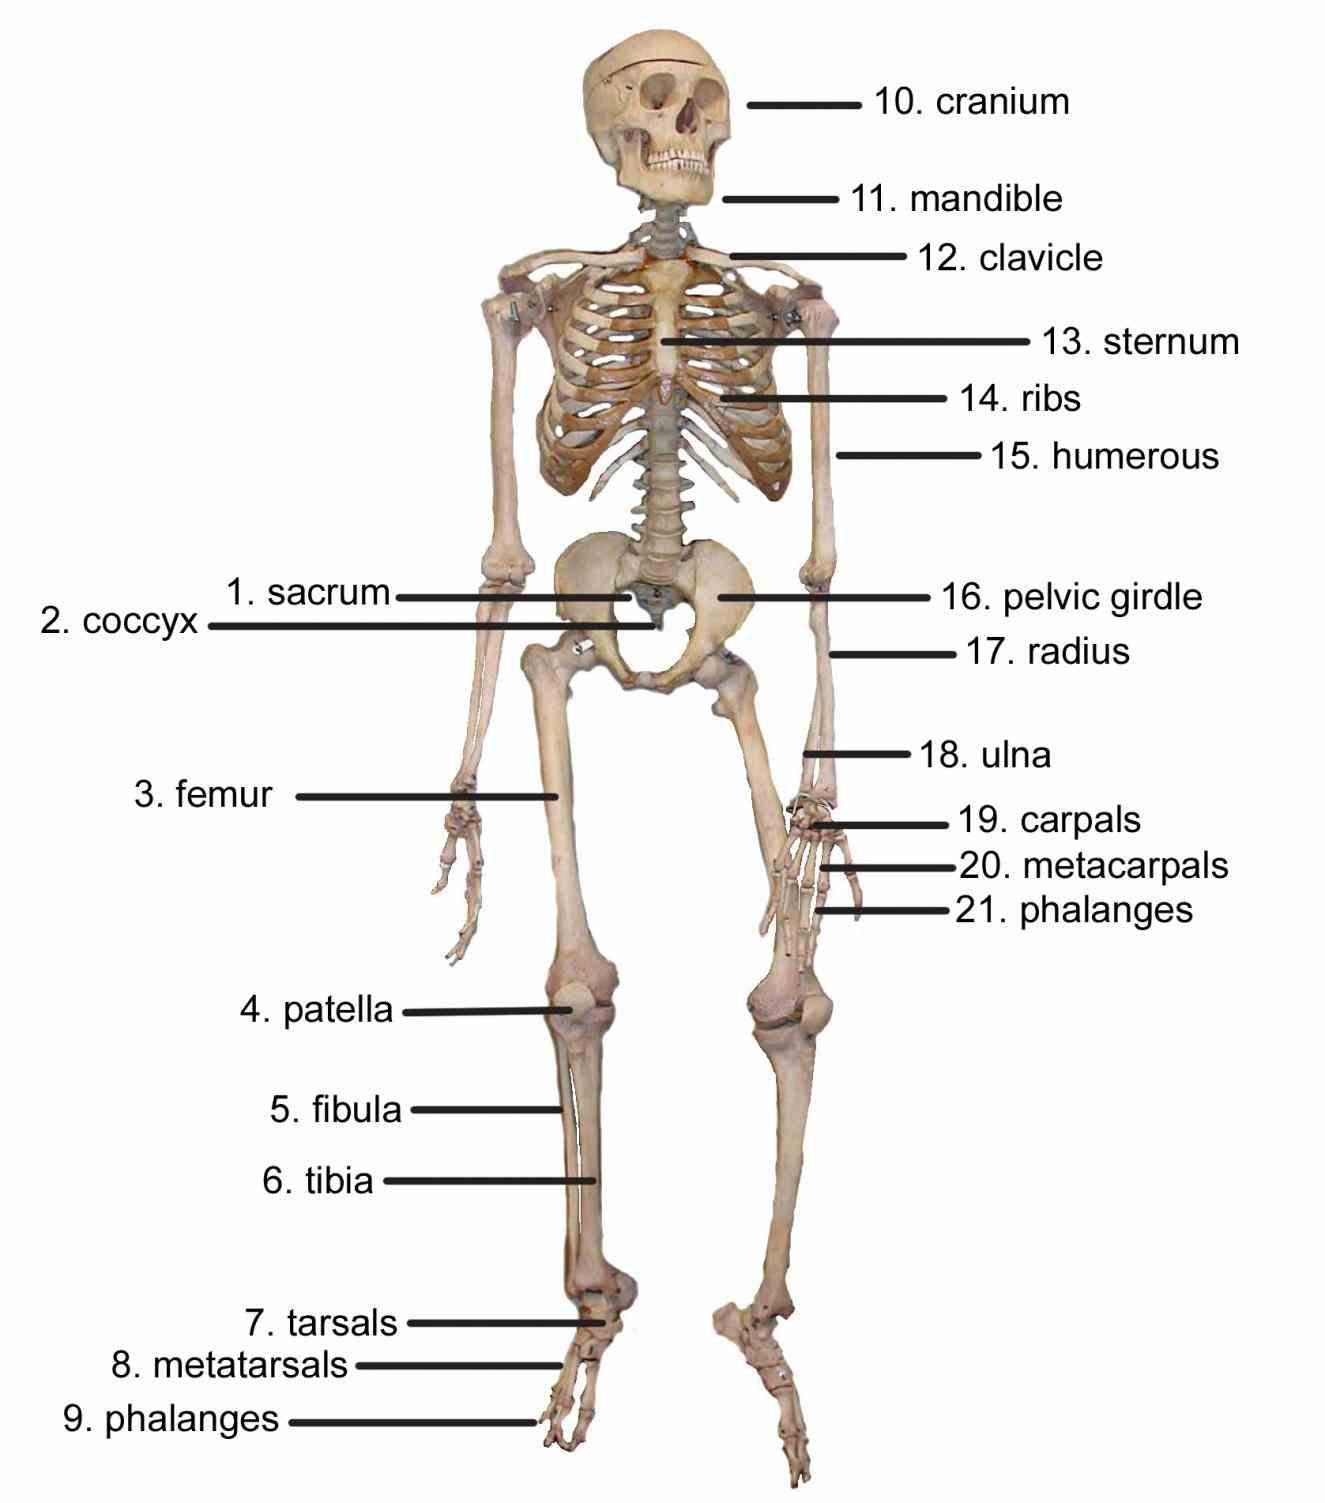 Major Bones Of The Human Skeleton Anatomy Pictures Wallpapers